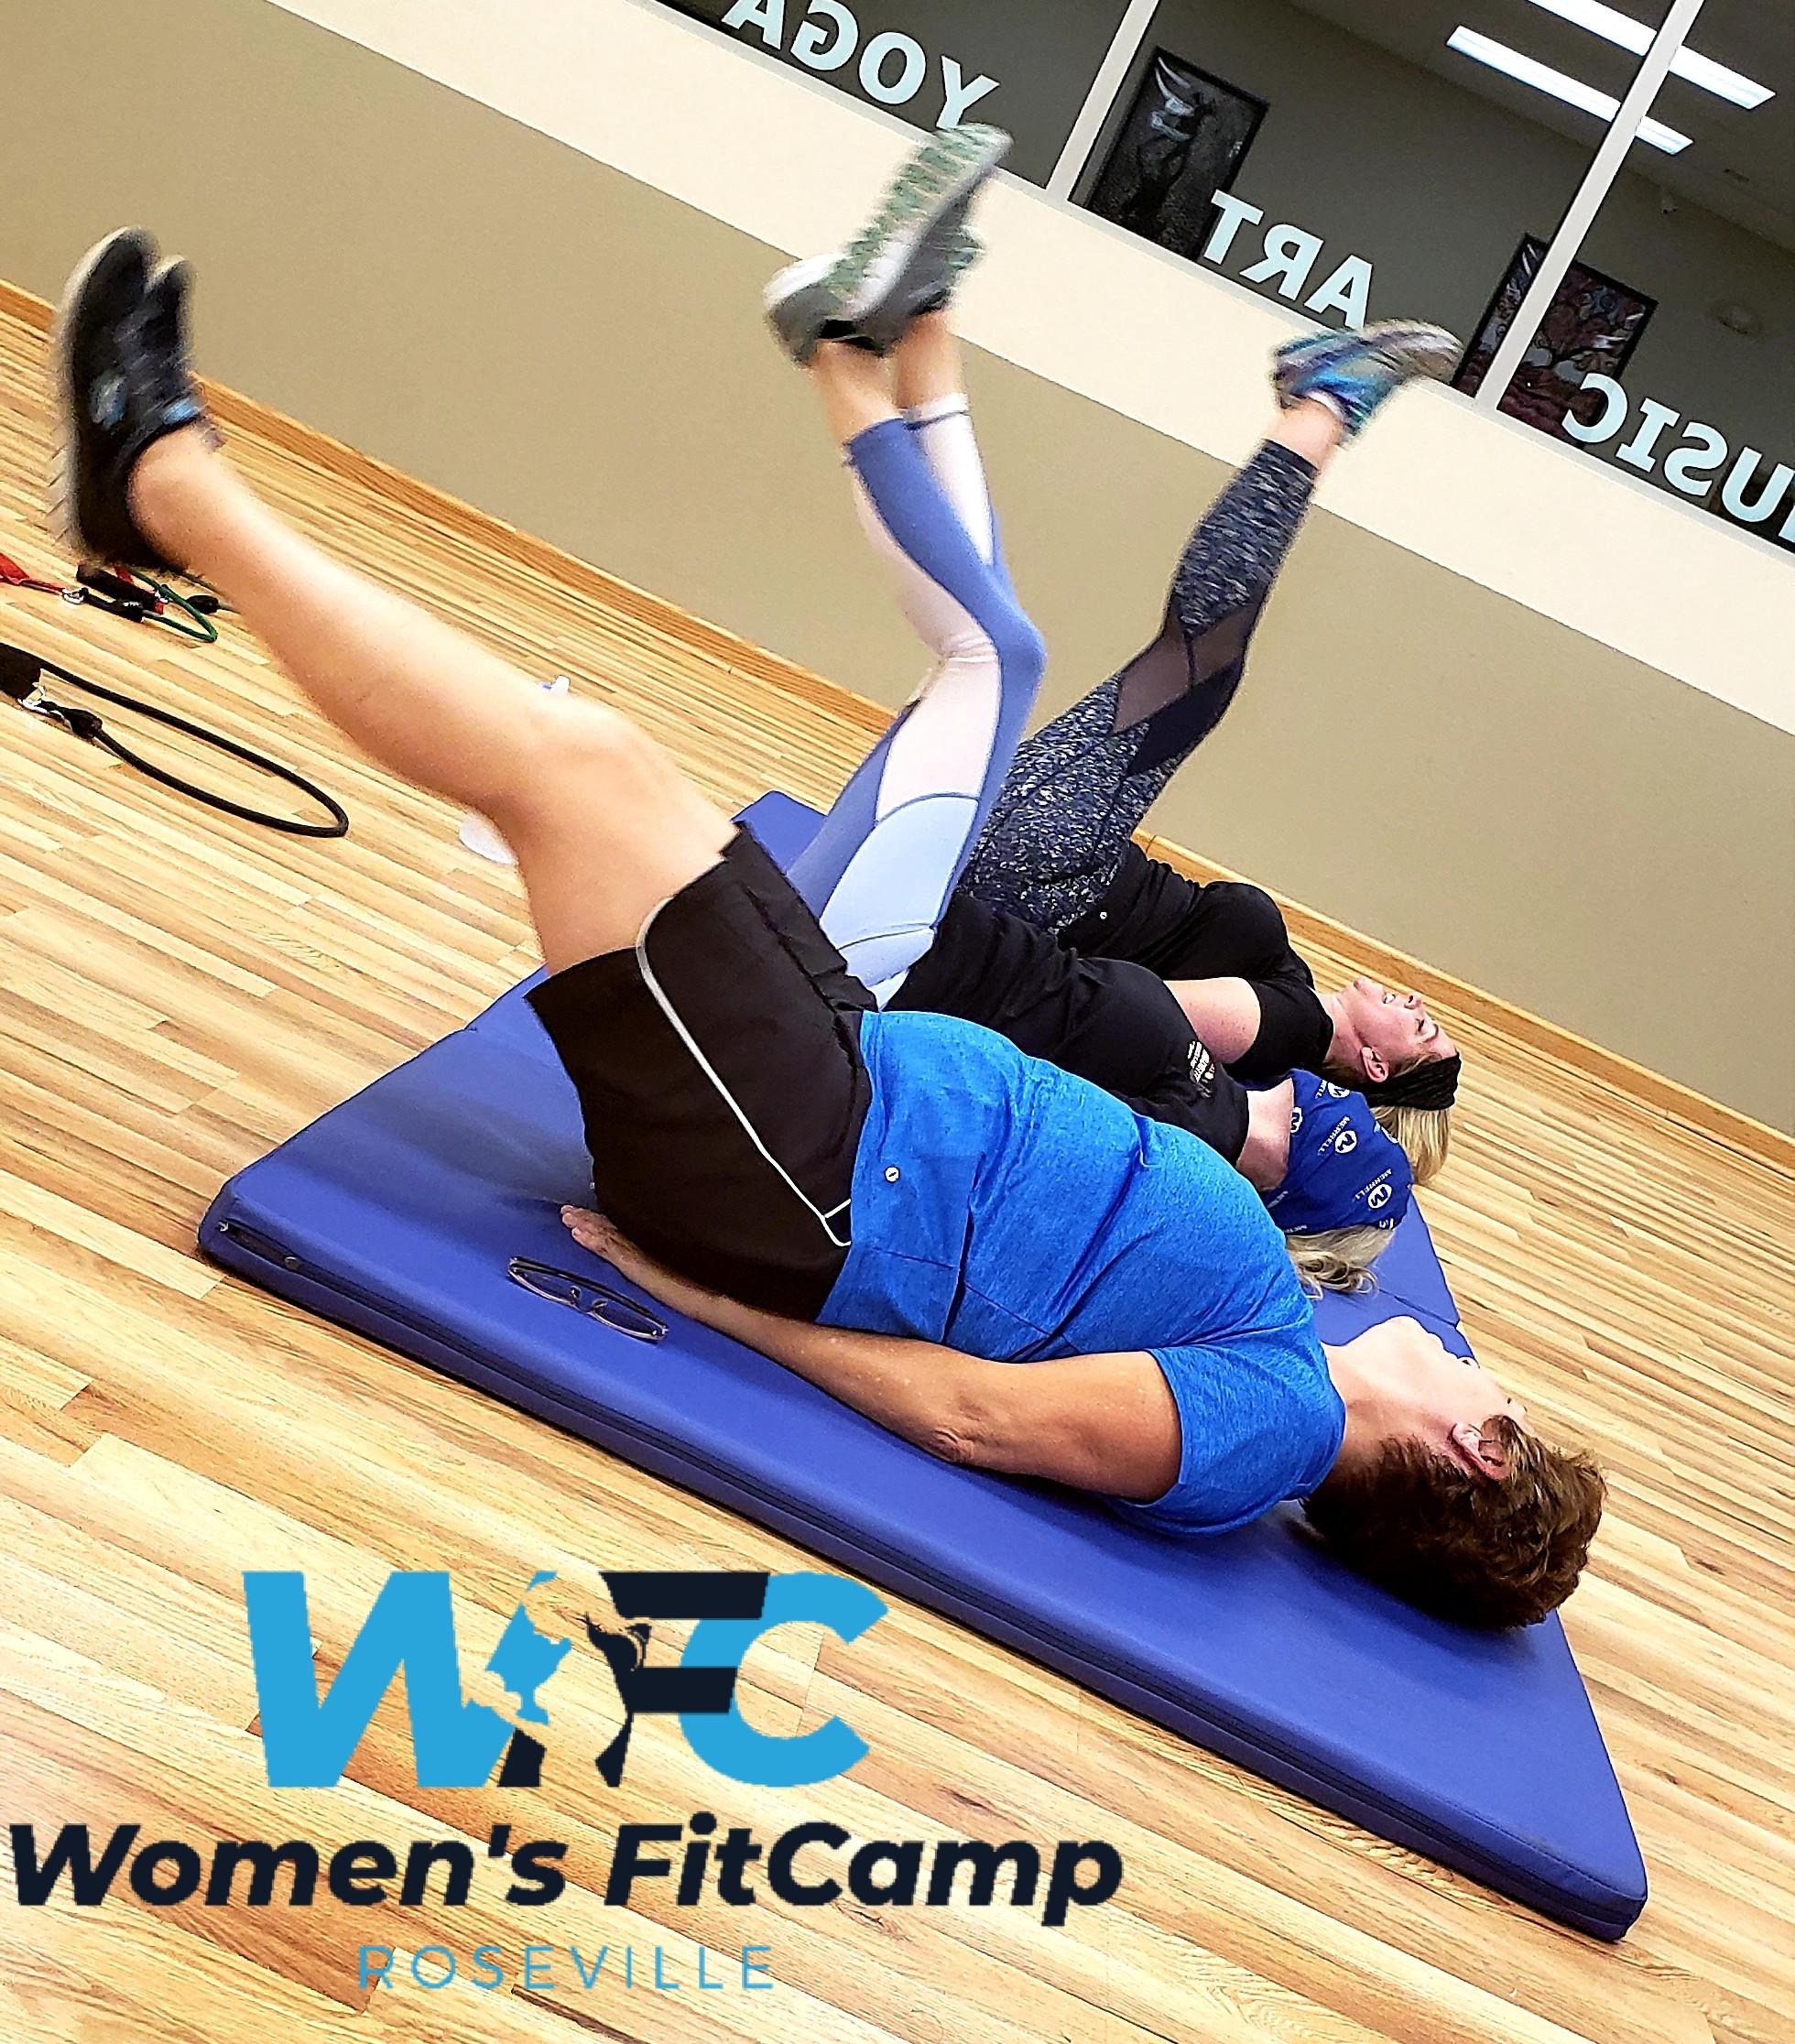 FREE Week at Women's FitCamp